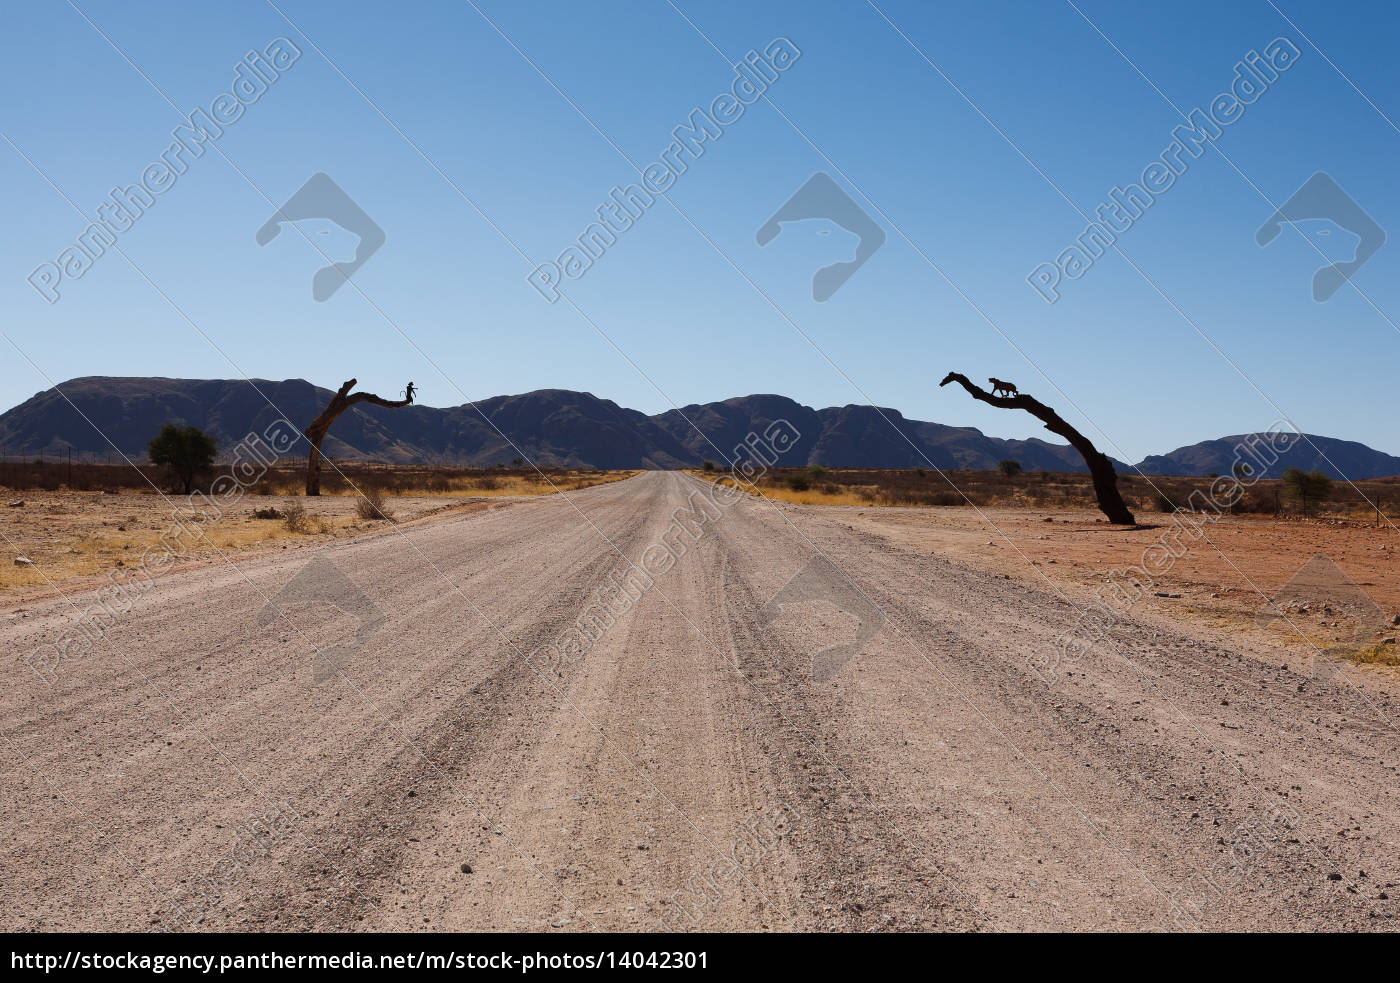 blue, travel, horizon, animal, tourism, africa - 14042301